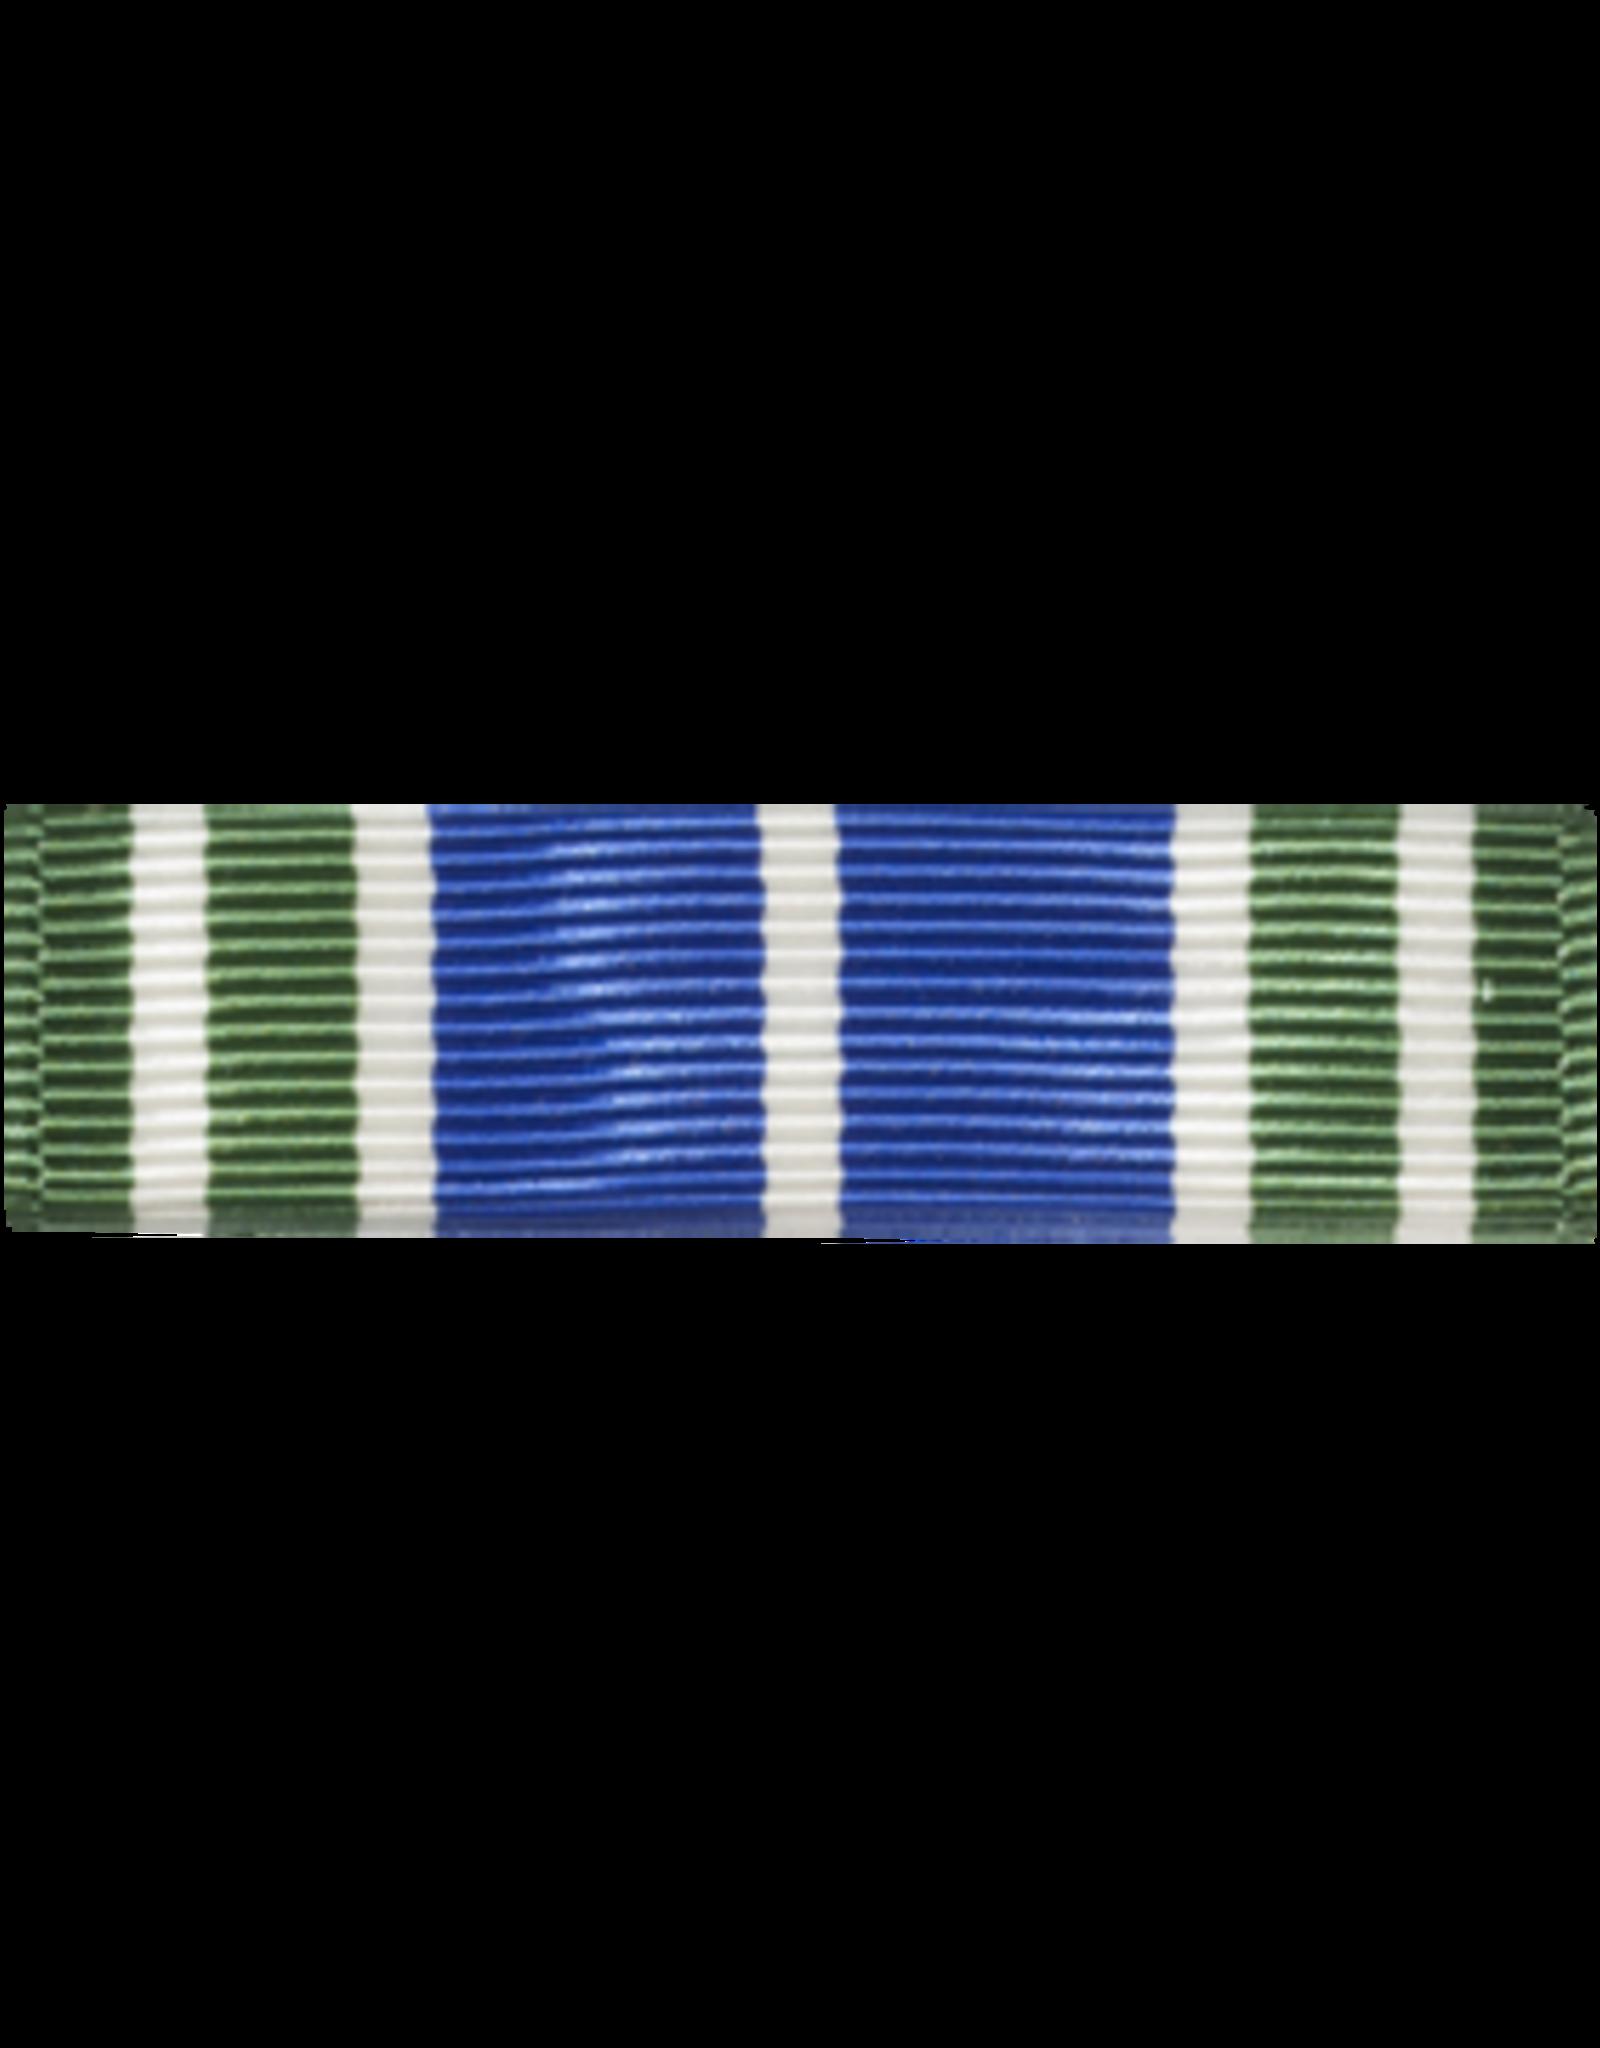 Ribbon - Army Achievement